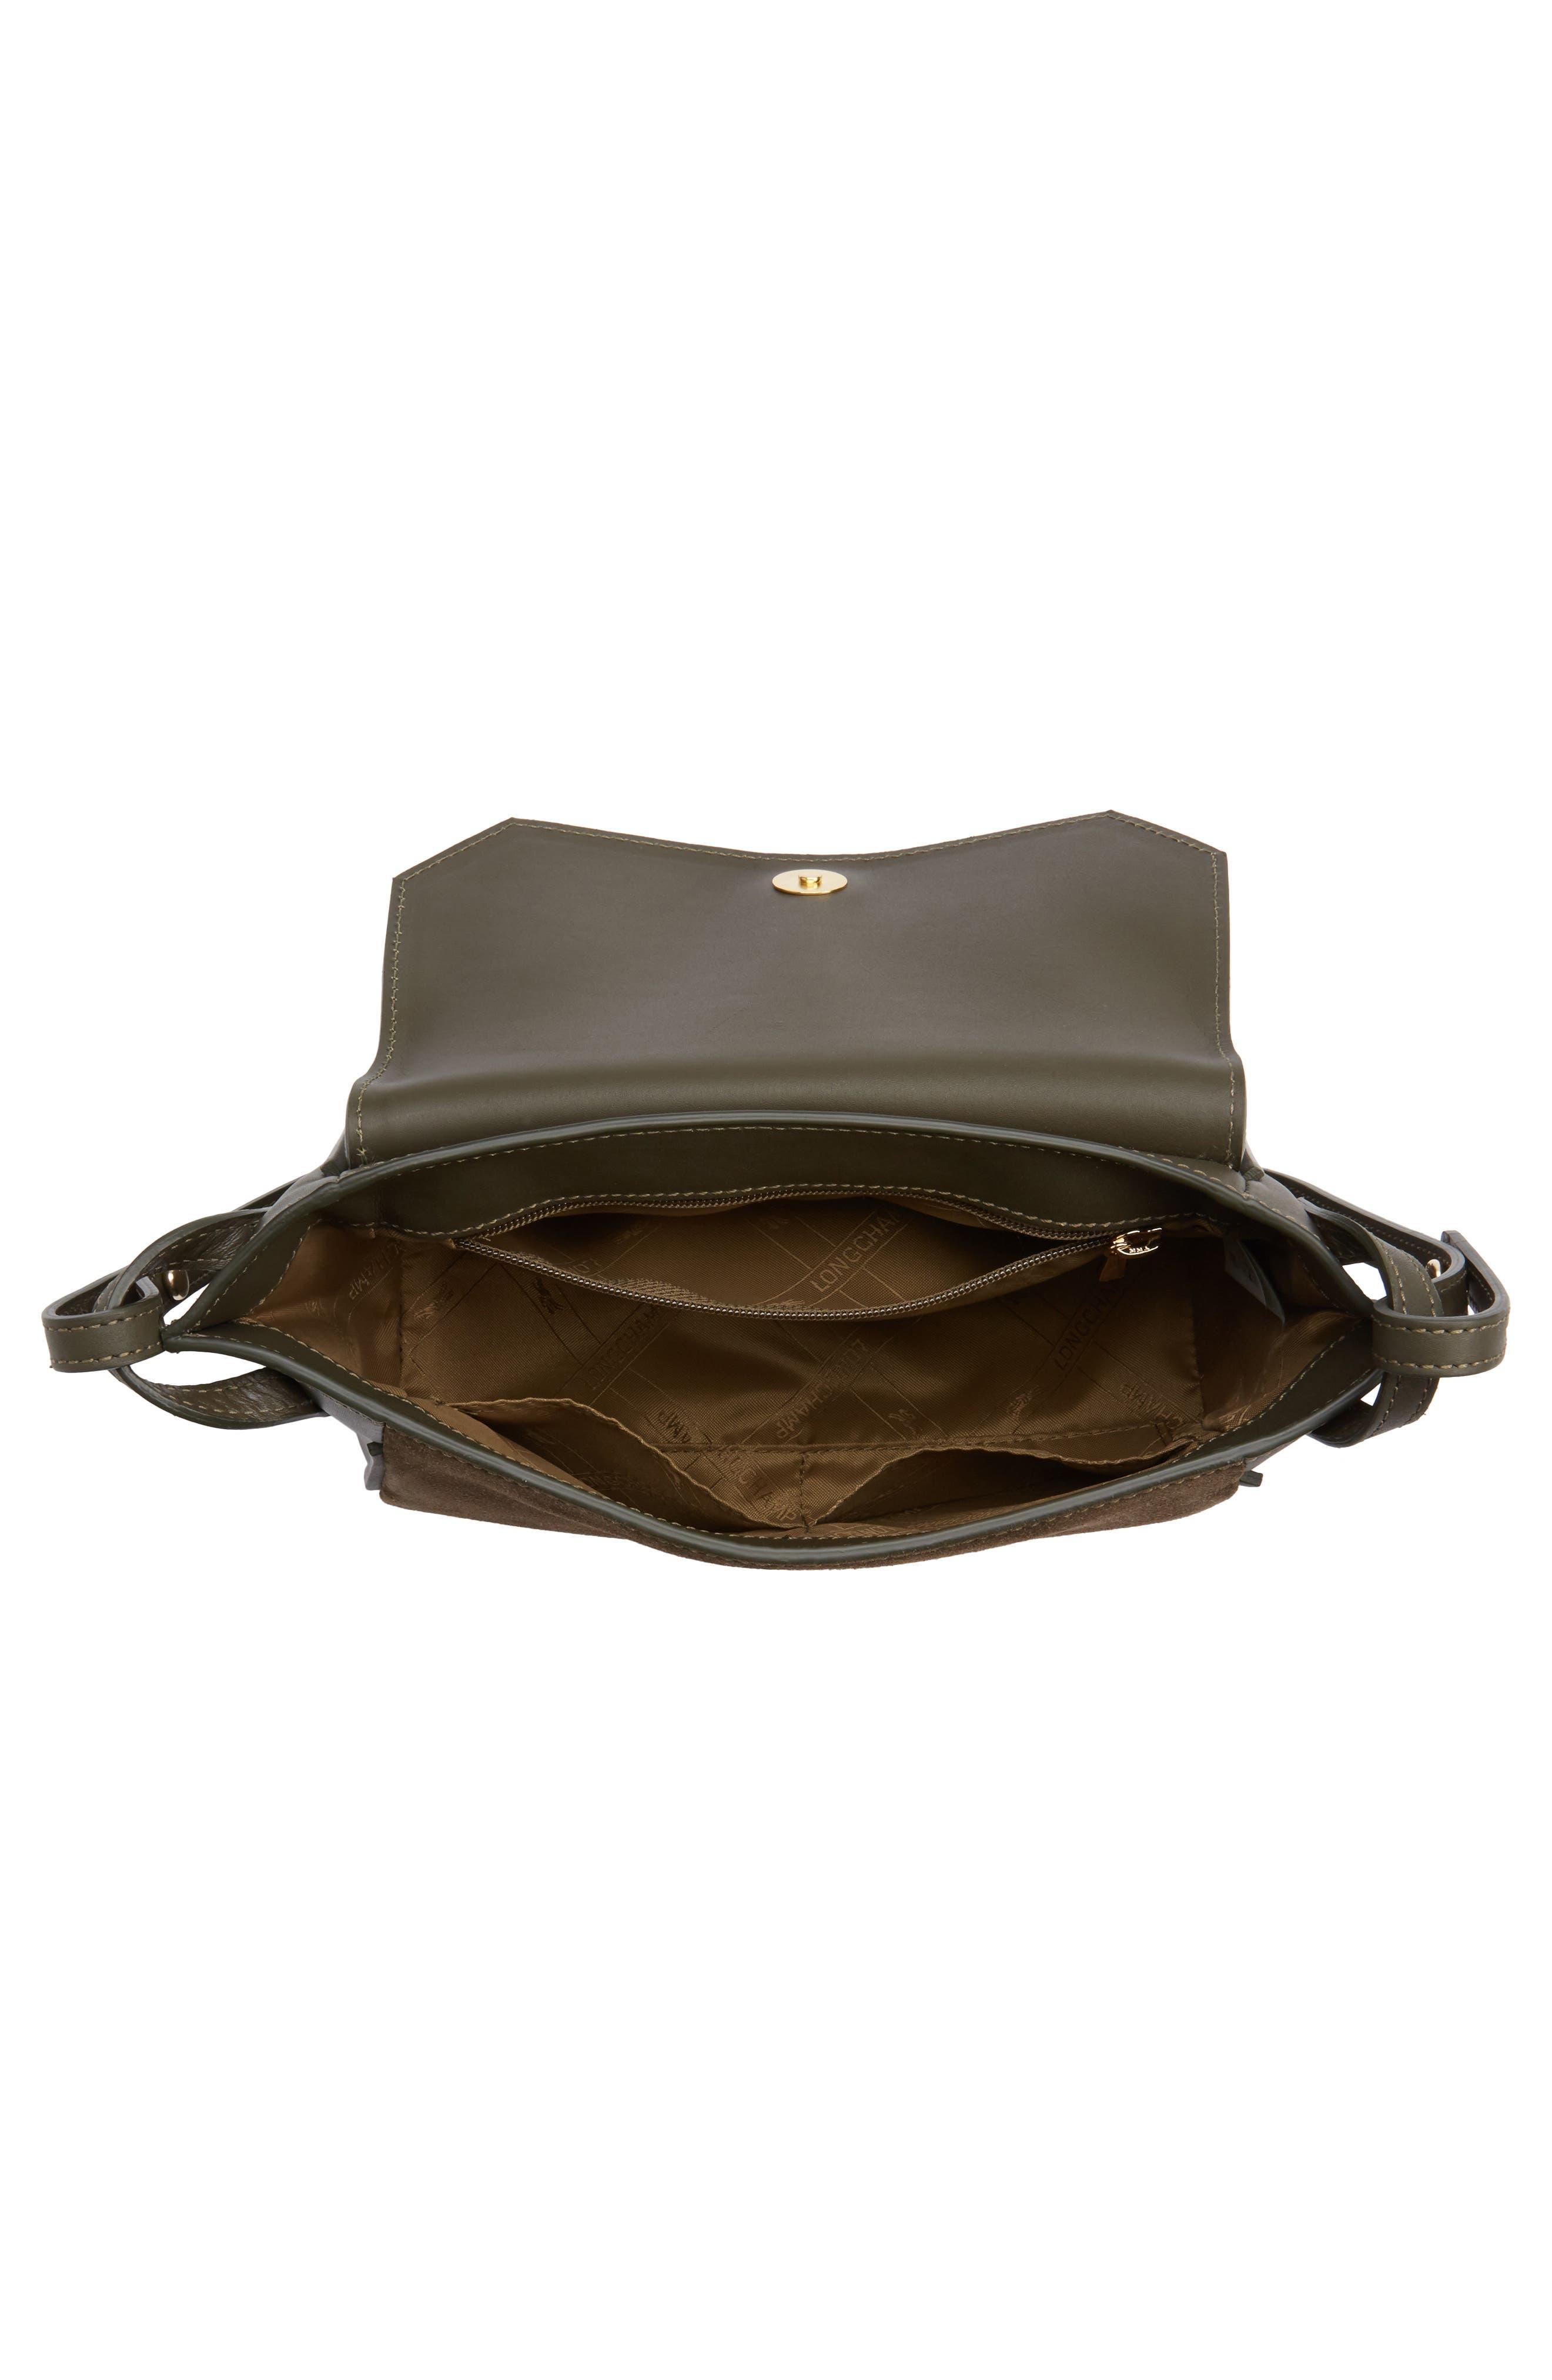 Small Penelope Leather Crossbody Bag,                             Alternate thumbnail 4, color,